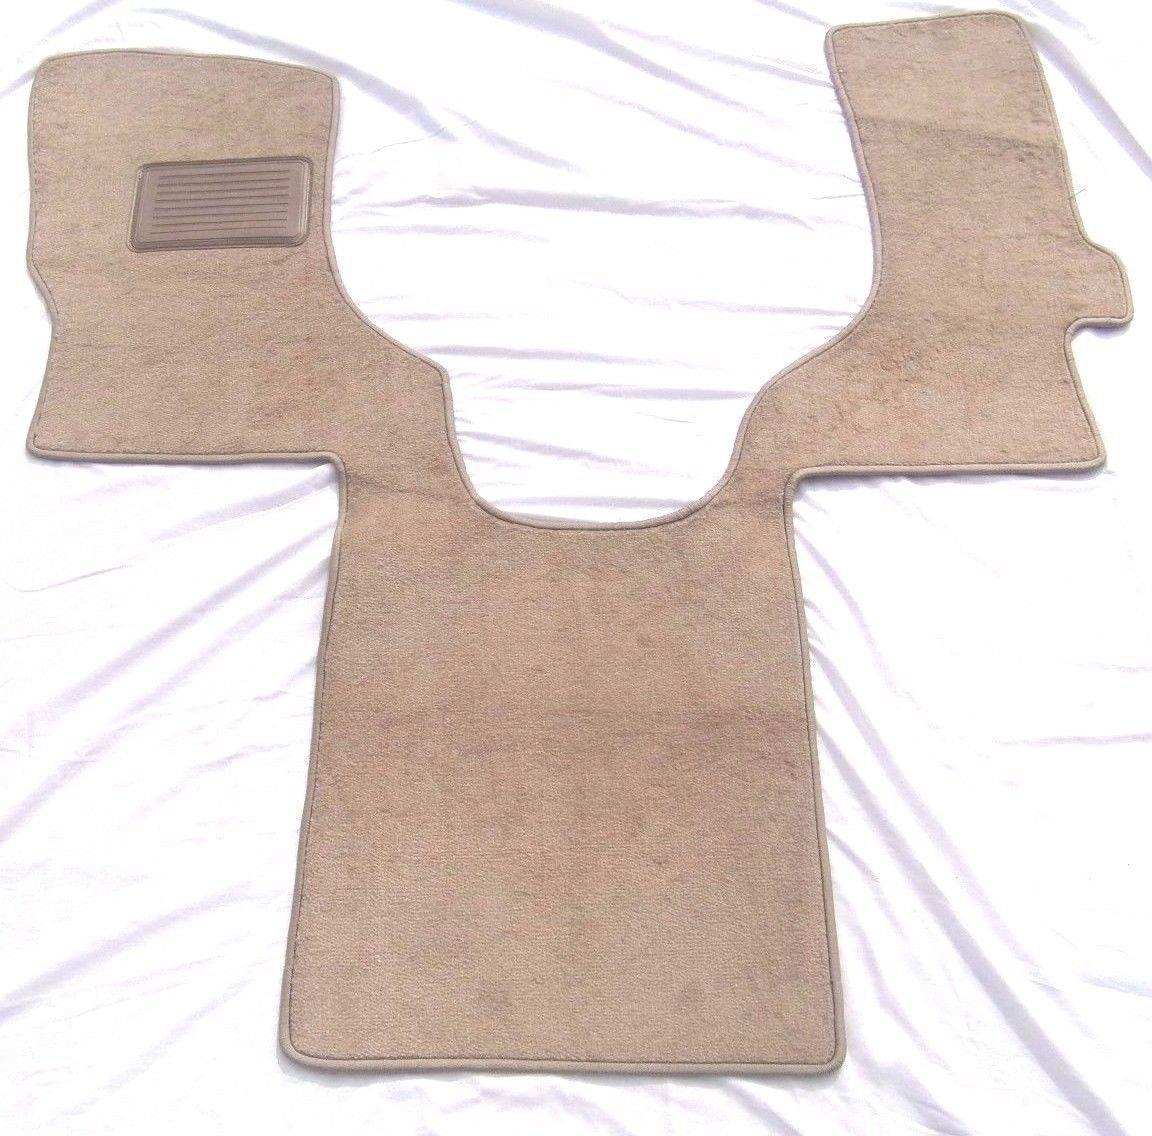 Serged Edges /& Heel Pad Downard Automotive Ford Econoline//E-Series Floor Mat Carpet Custom Fit Replacement Beige//Tan 1 PC Front Fits 2006-2017